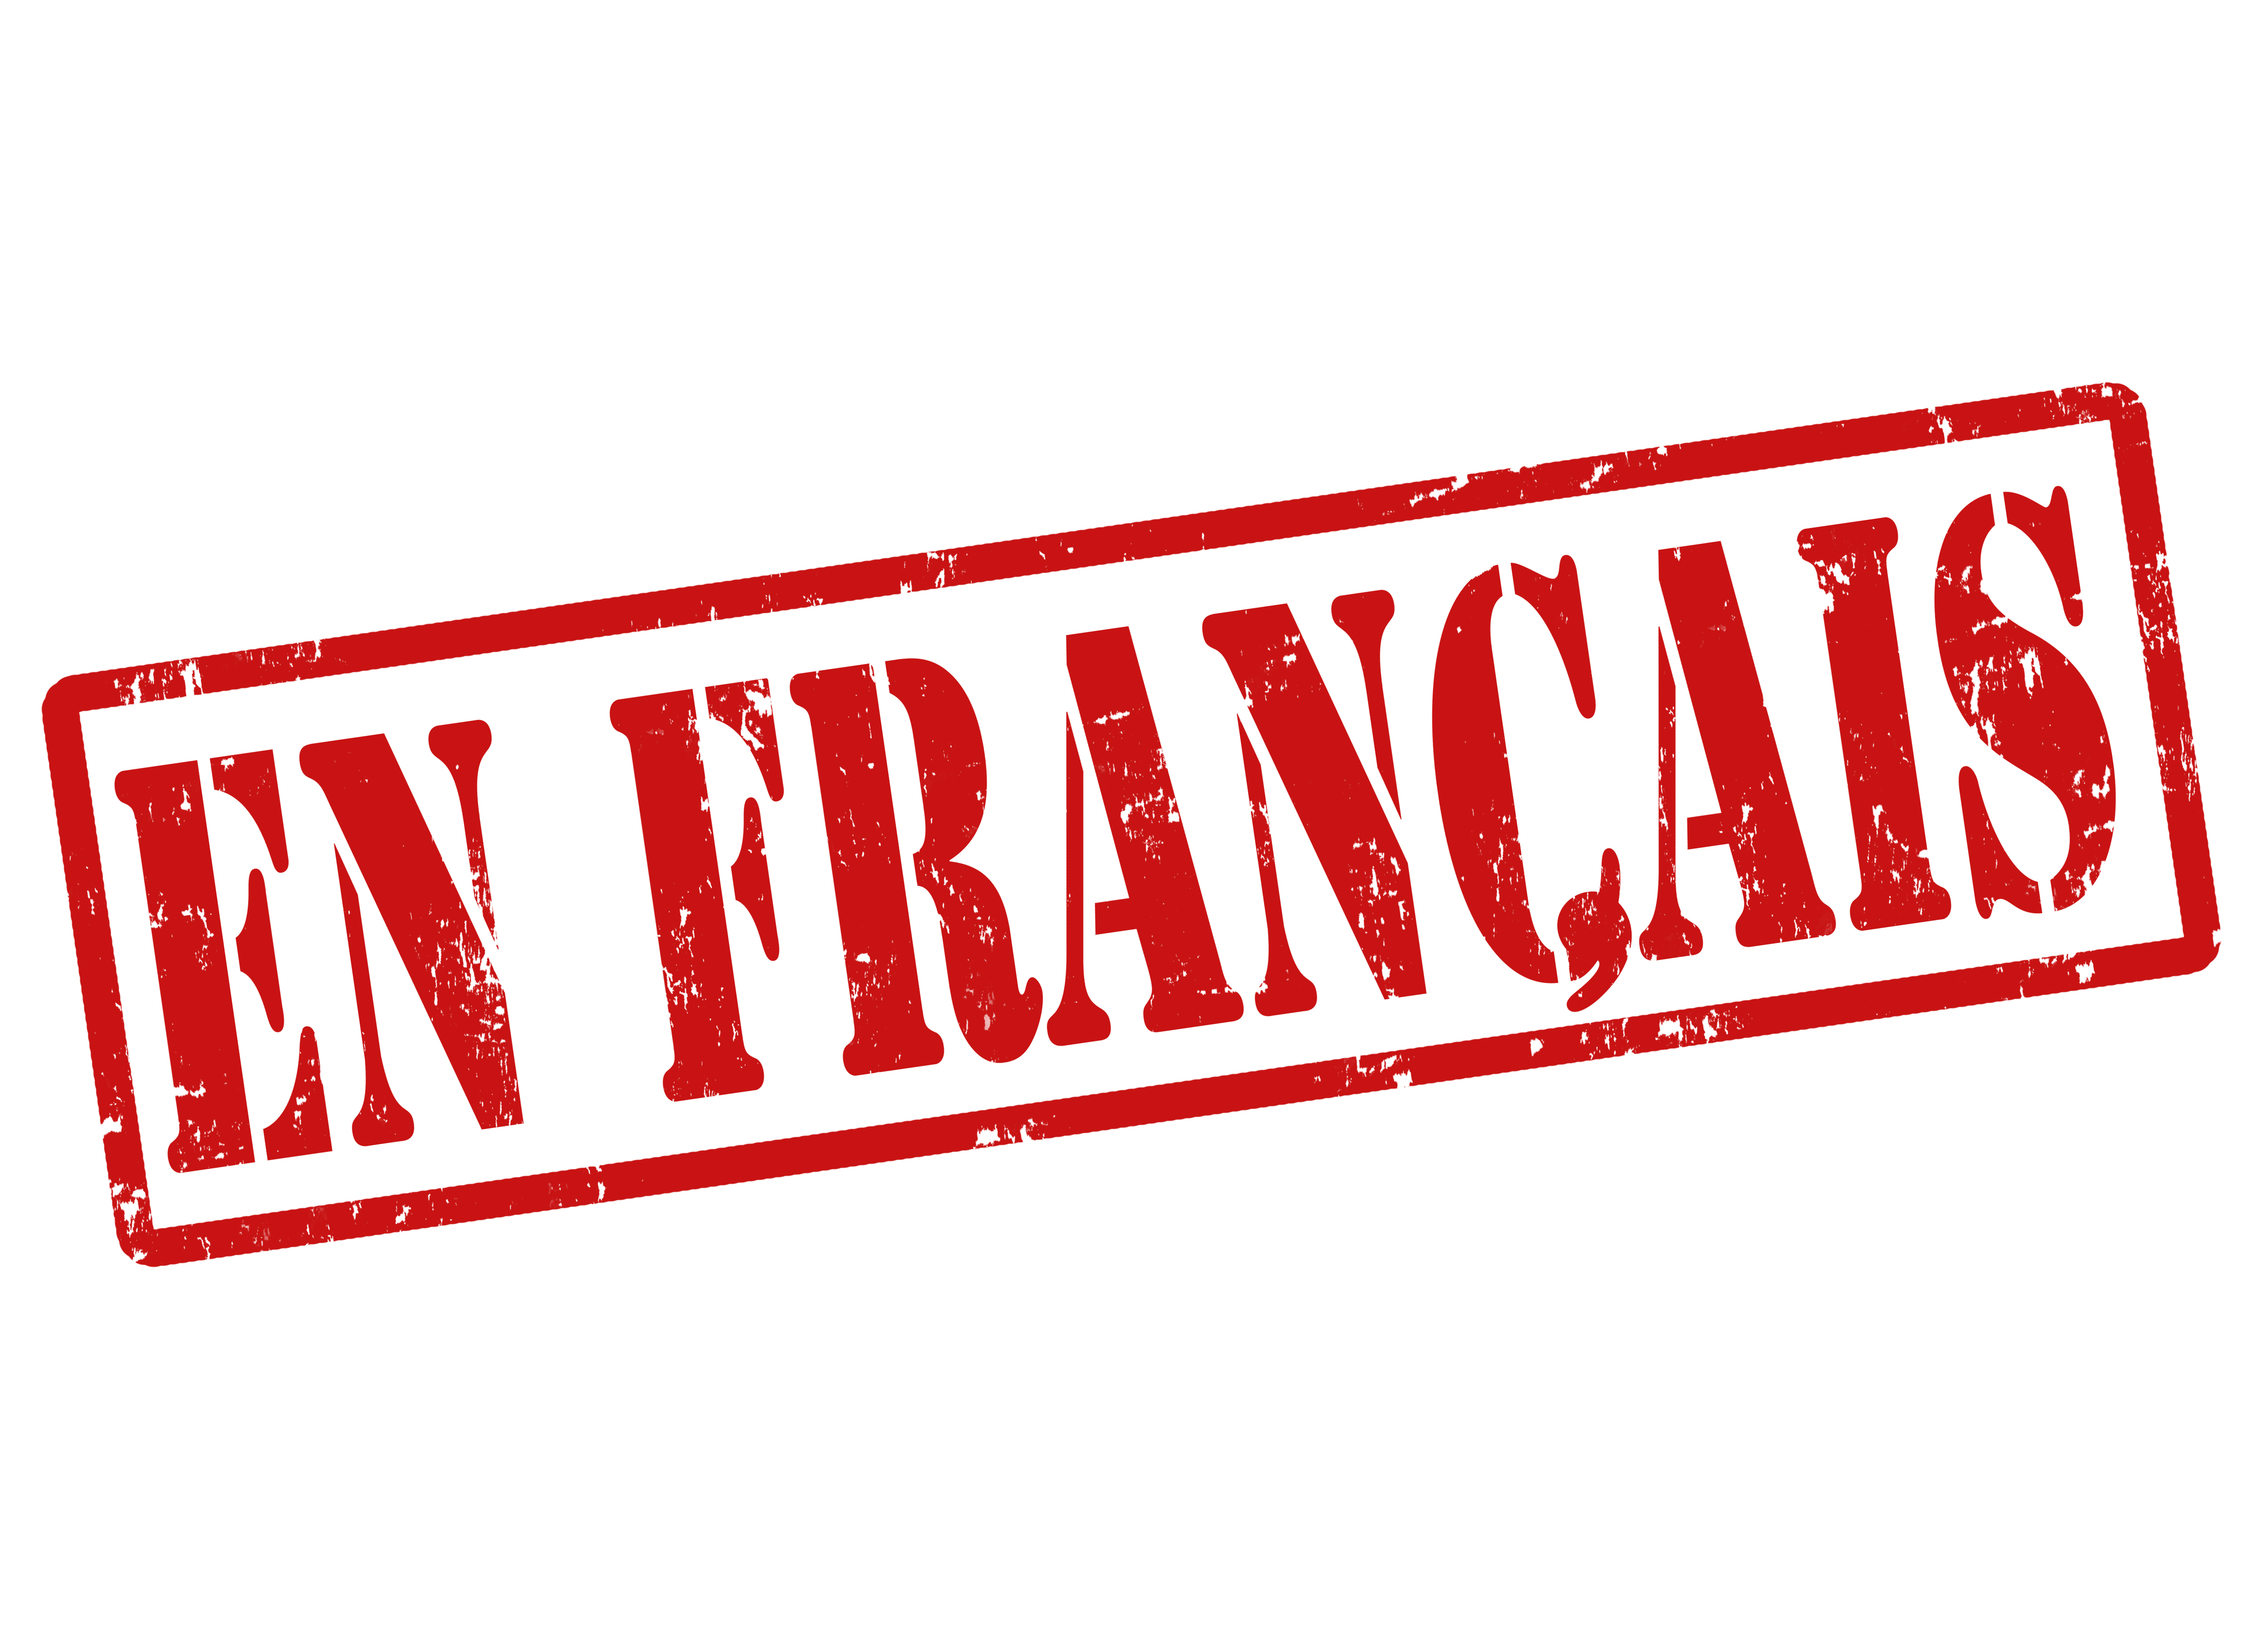 brock departments join forces for november in french novembre en fran ais the brock news. Black Bedroom Furniture Sets. Home Design Ideas